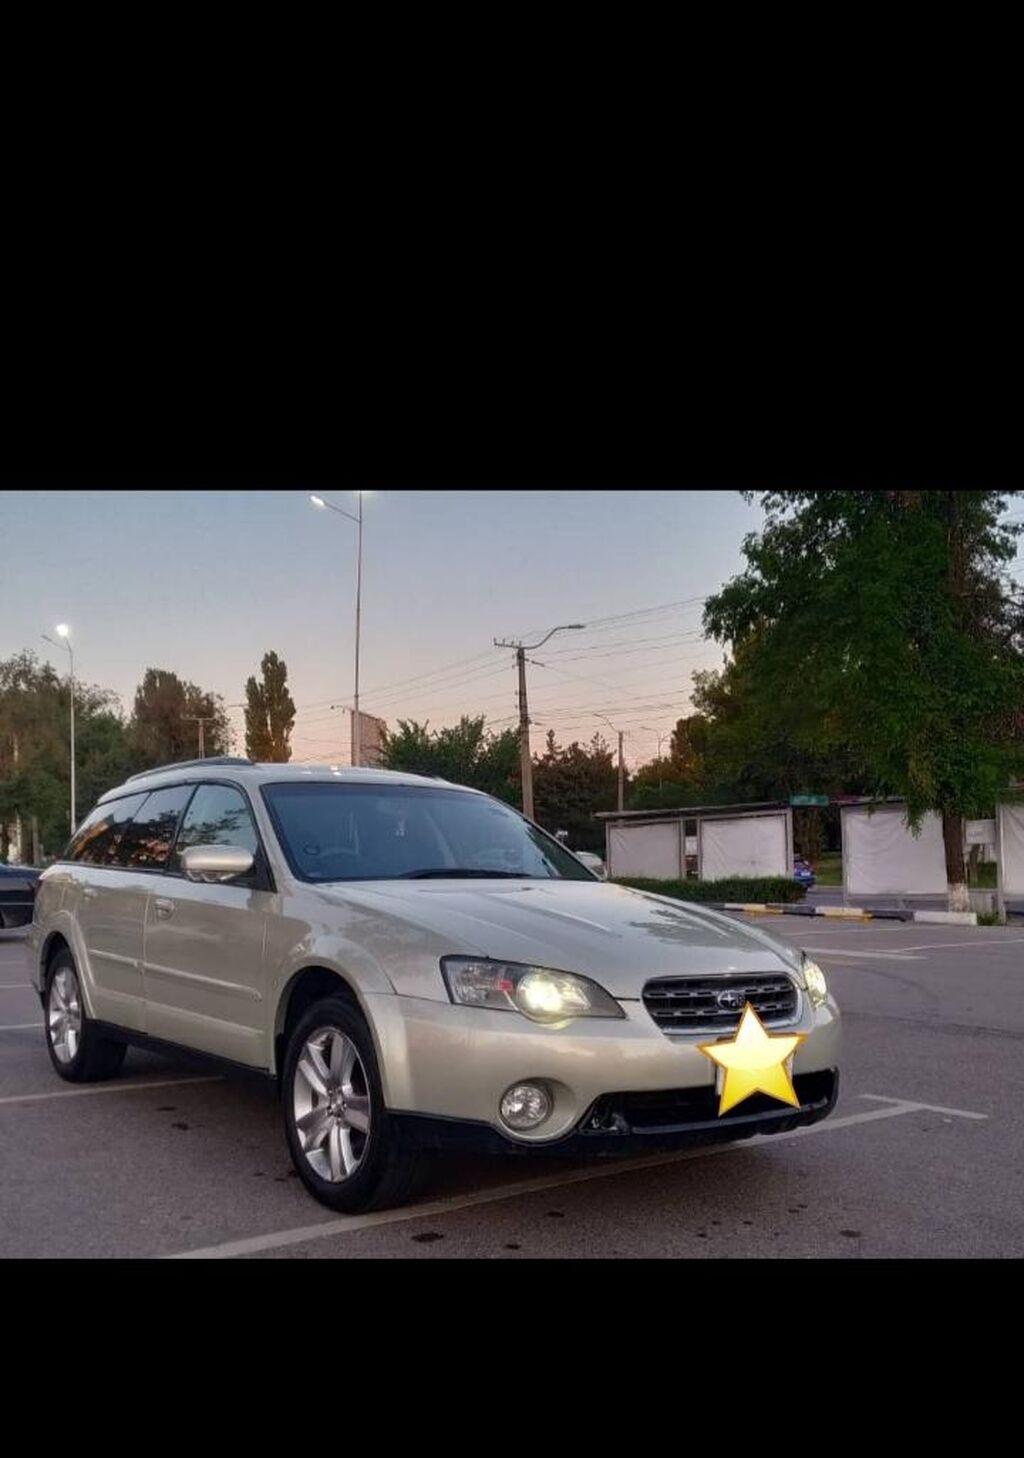 Subaru Outback 2.5 л. 2004 | 200000 км